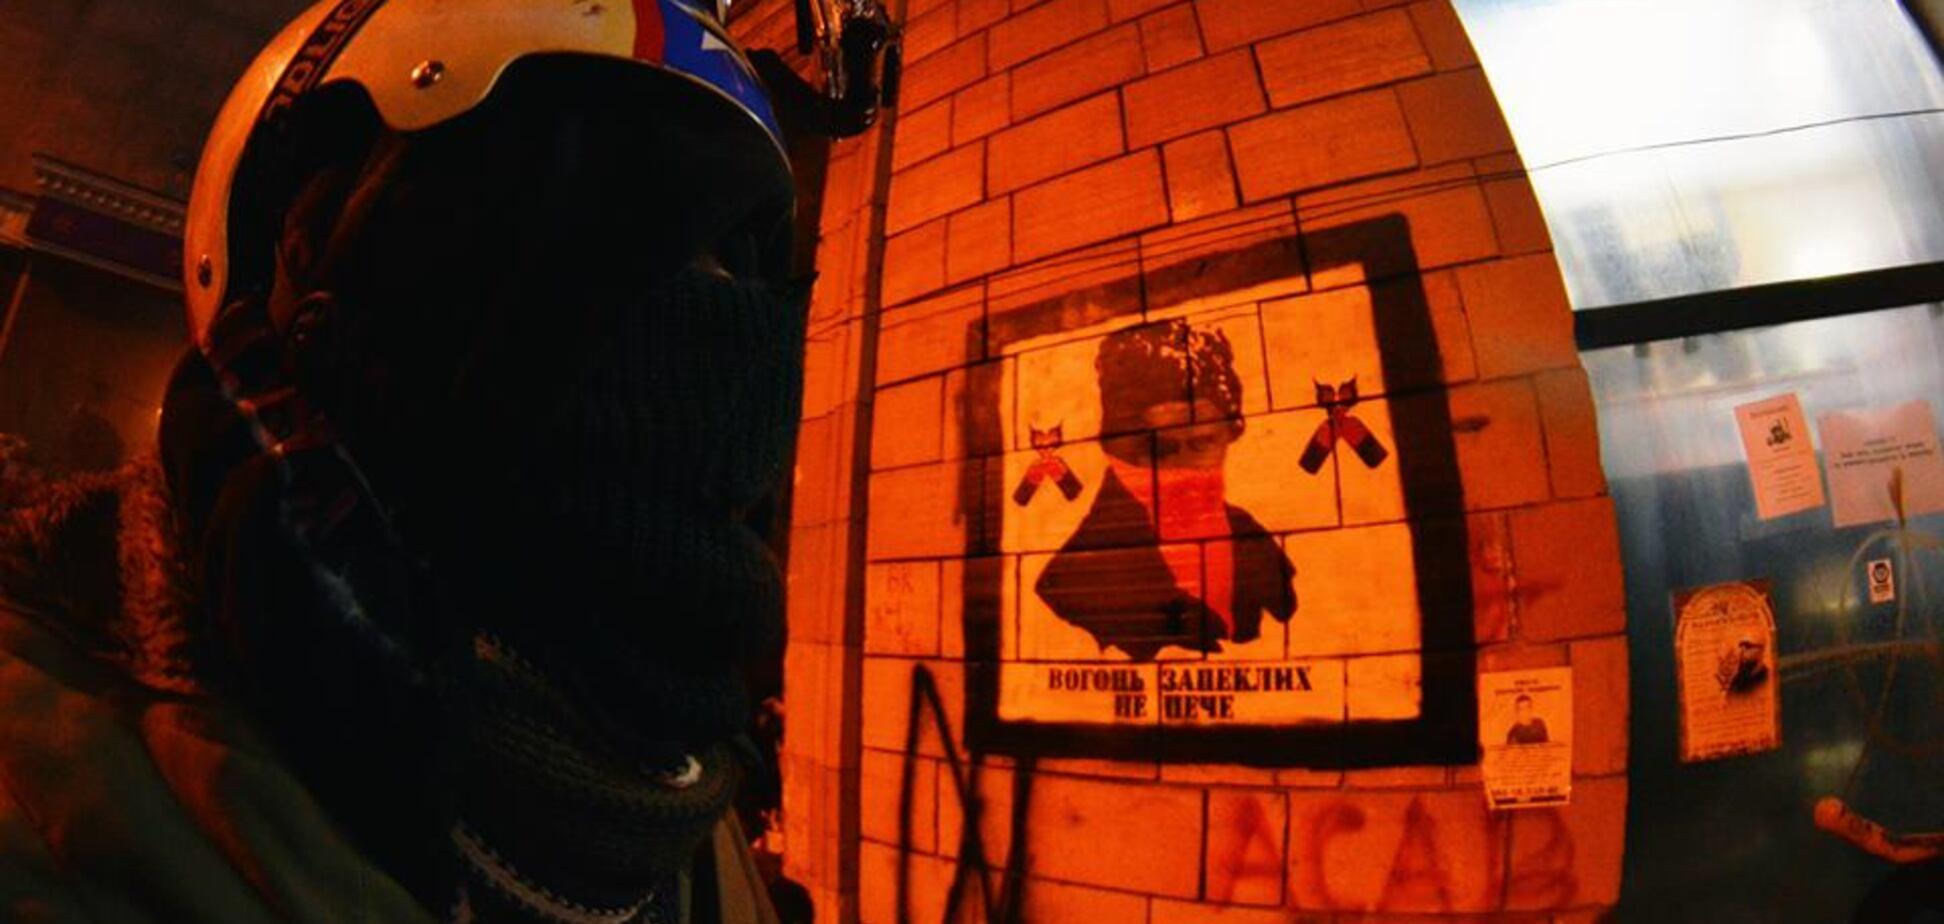 Скандал с граффити времен Майдана: автор 'икон' назвал их восстановление 'акцией вандализма'